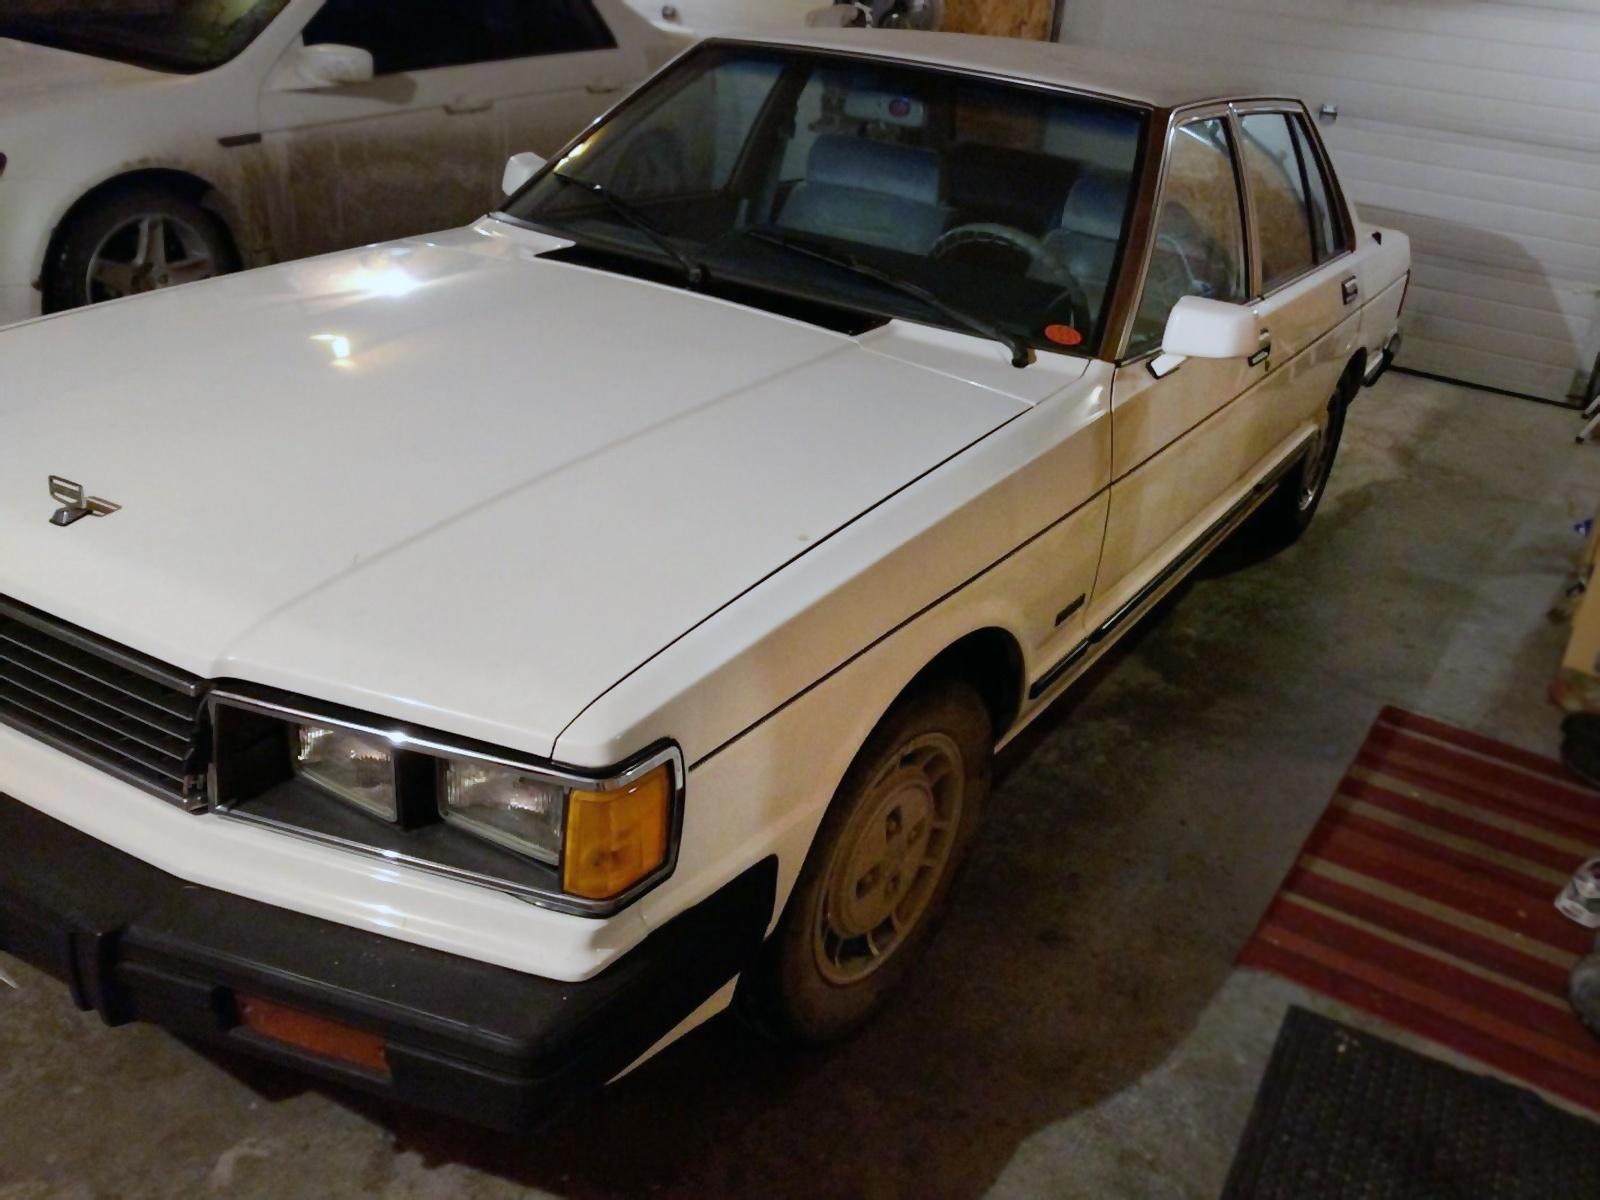 $1,673 Diesel Datsun! 1982 Datsun Maxima